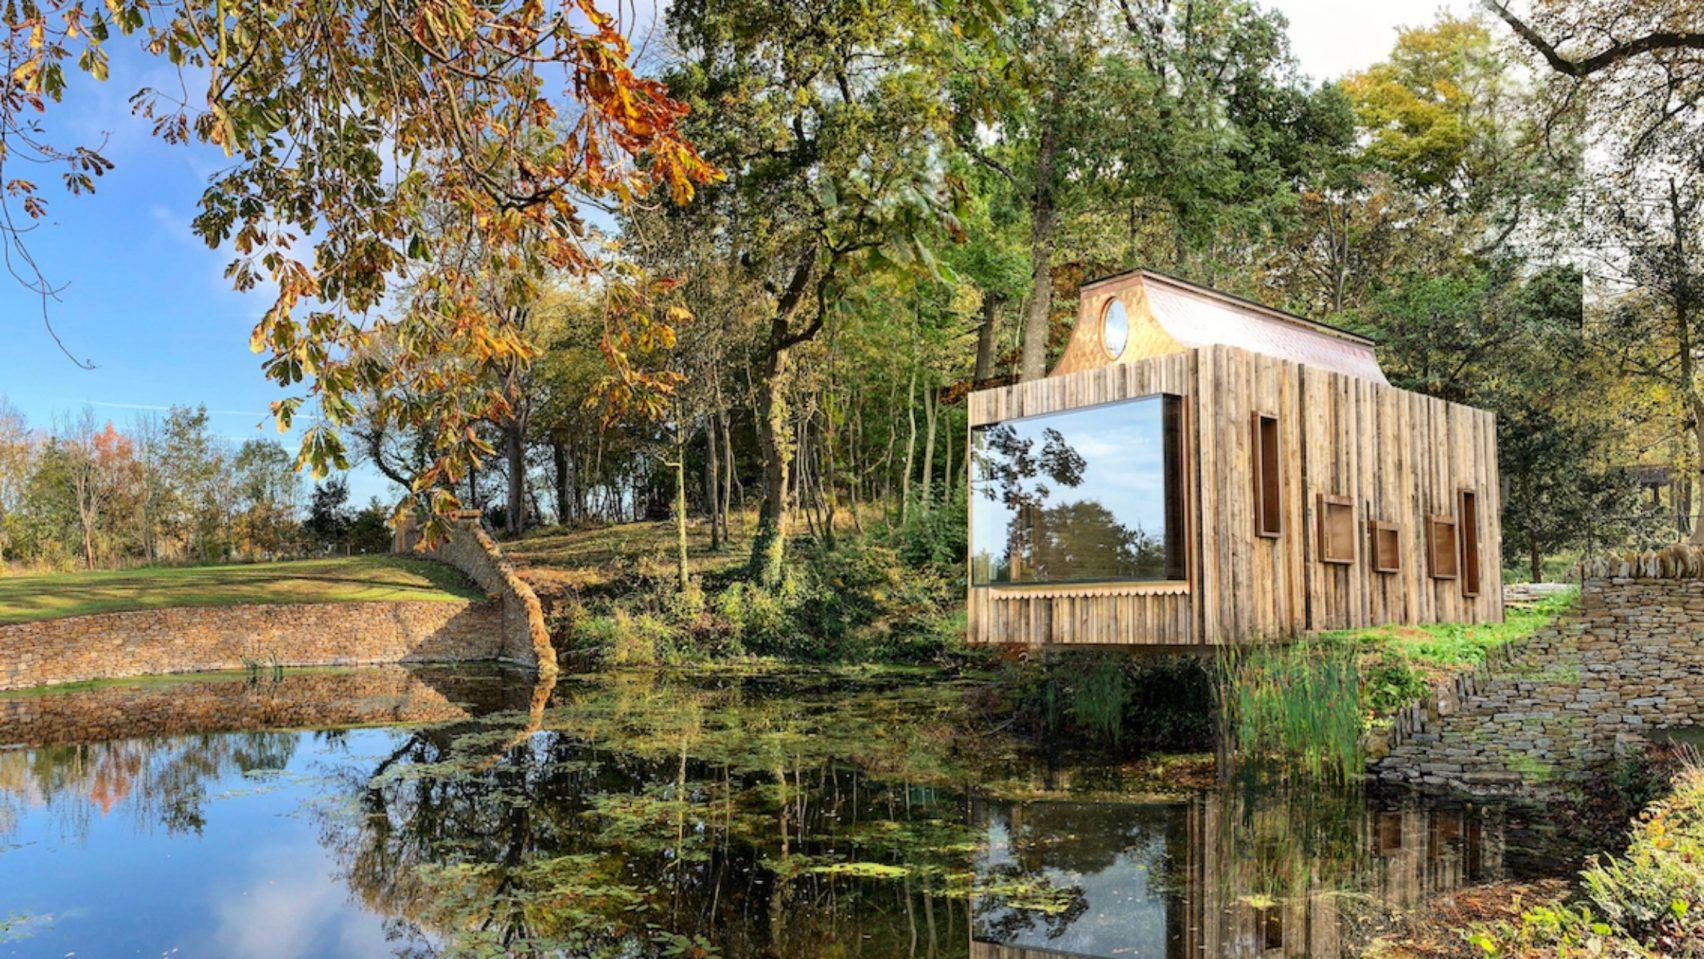 waterside-bee-hotel-apiary-newt-hotel